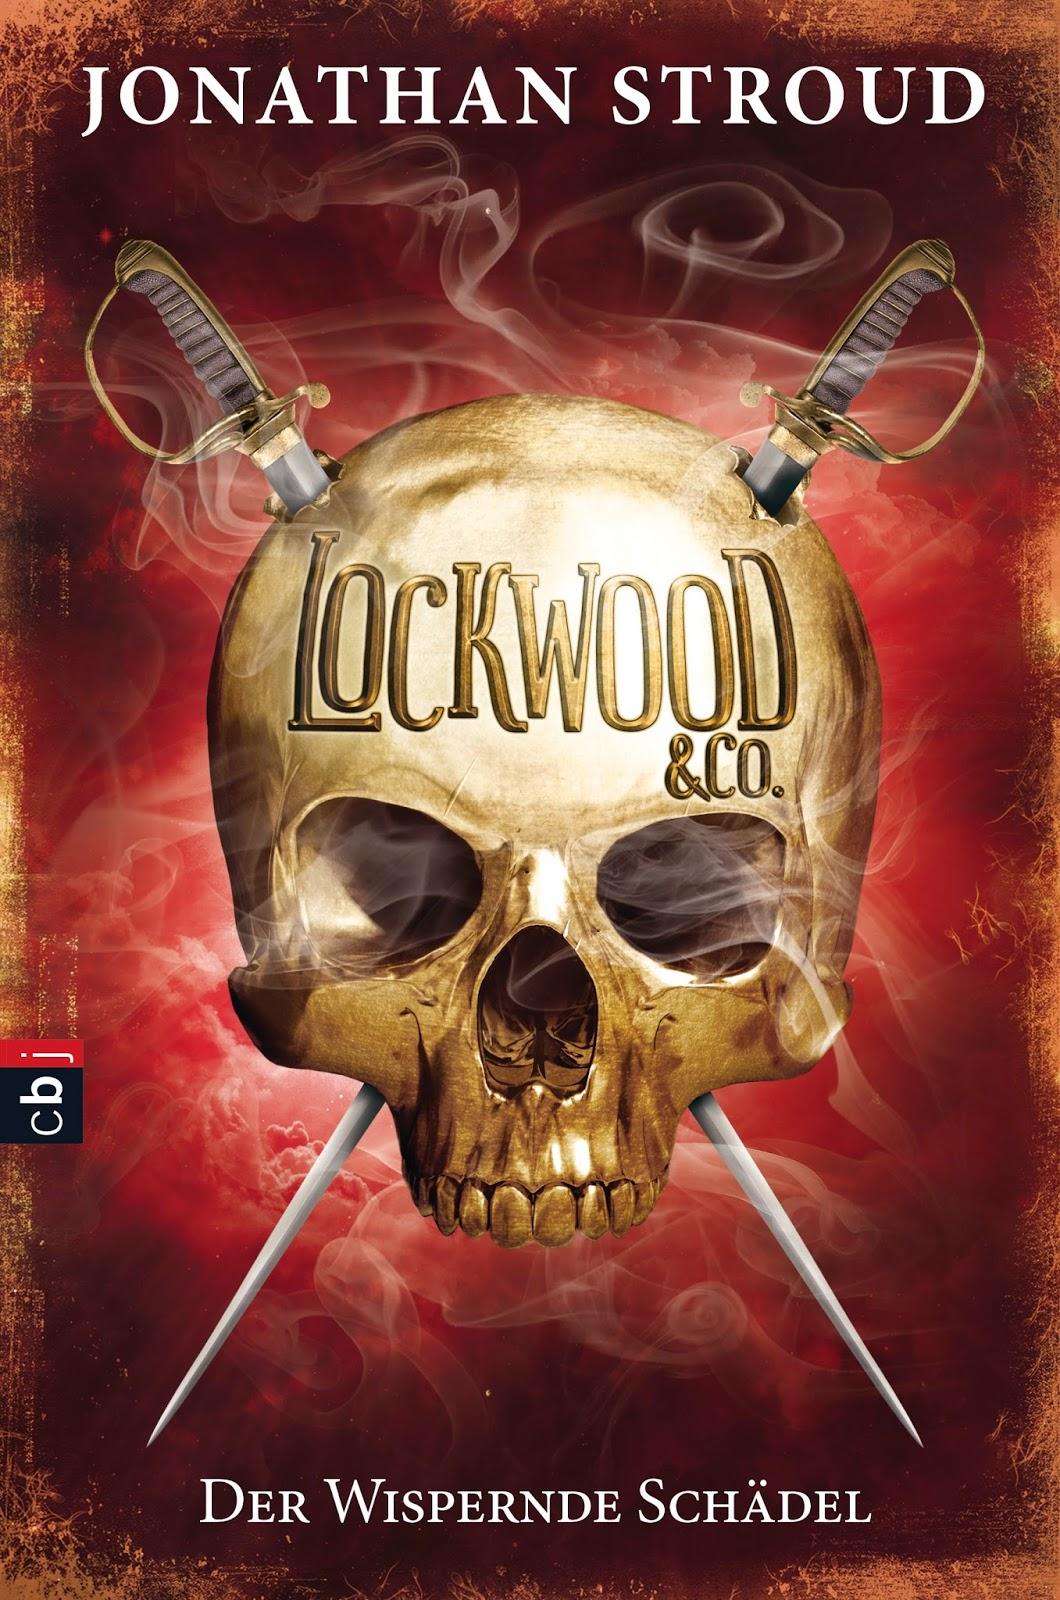 http://www.randomhouse.de/content/edition/covervoila_hires/Stroud_JLockwood_Co_02_-_Wispernde_146314.jpg